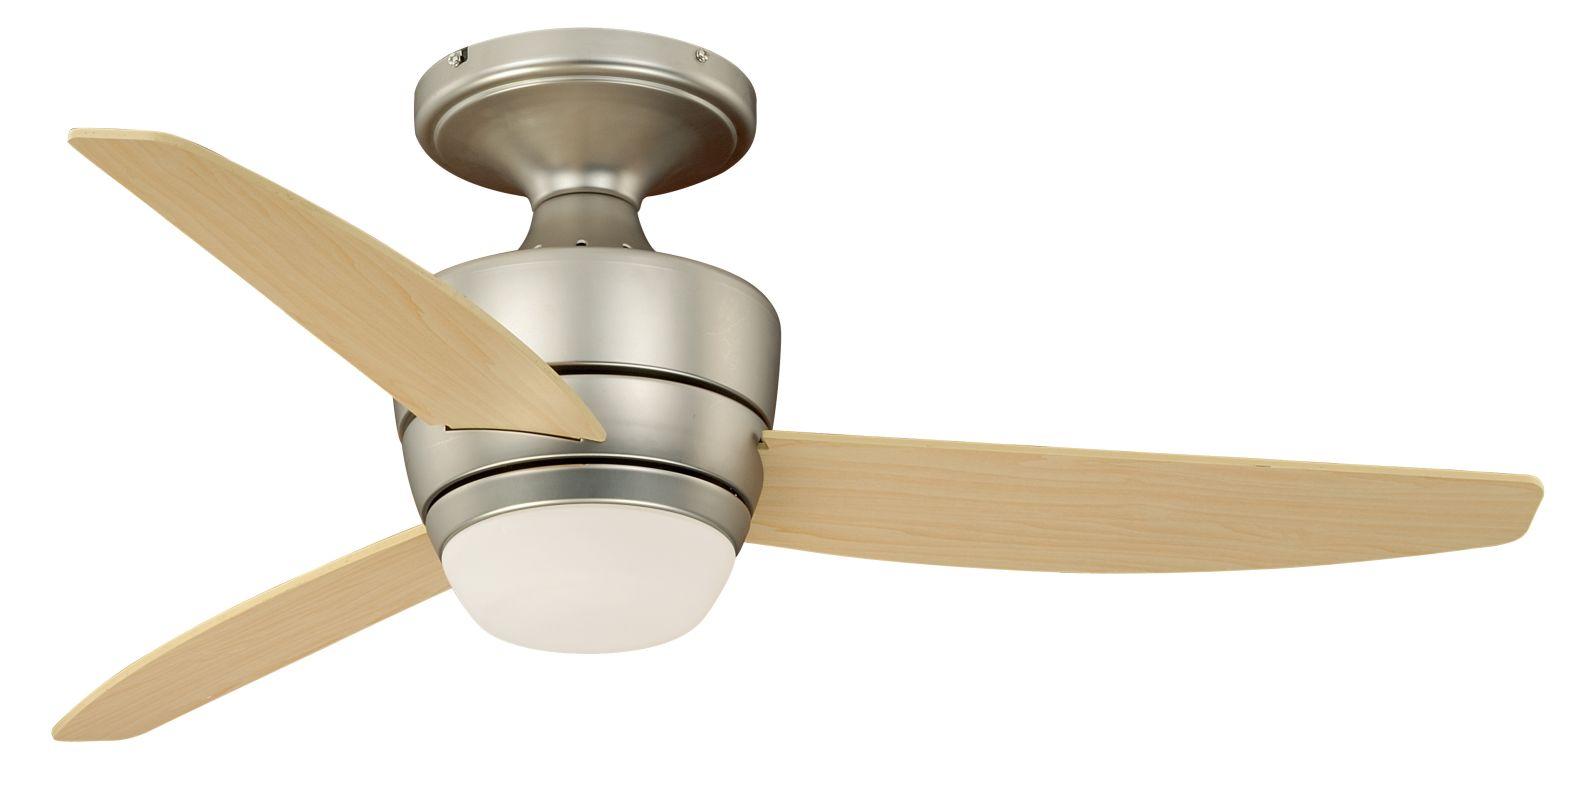 "Vaxcel Lighting F0032 Adrian 44"" 3 Blade Indoor Ceiling Fan - Light"